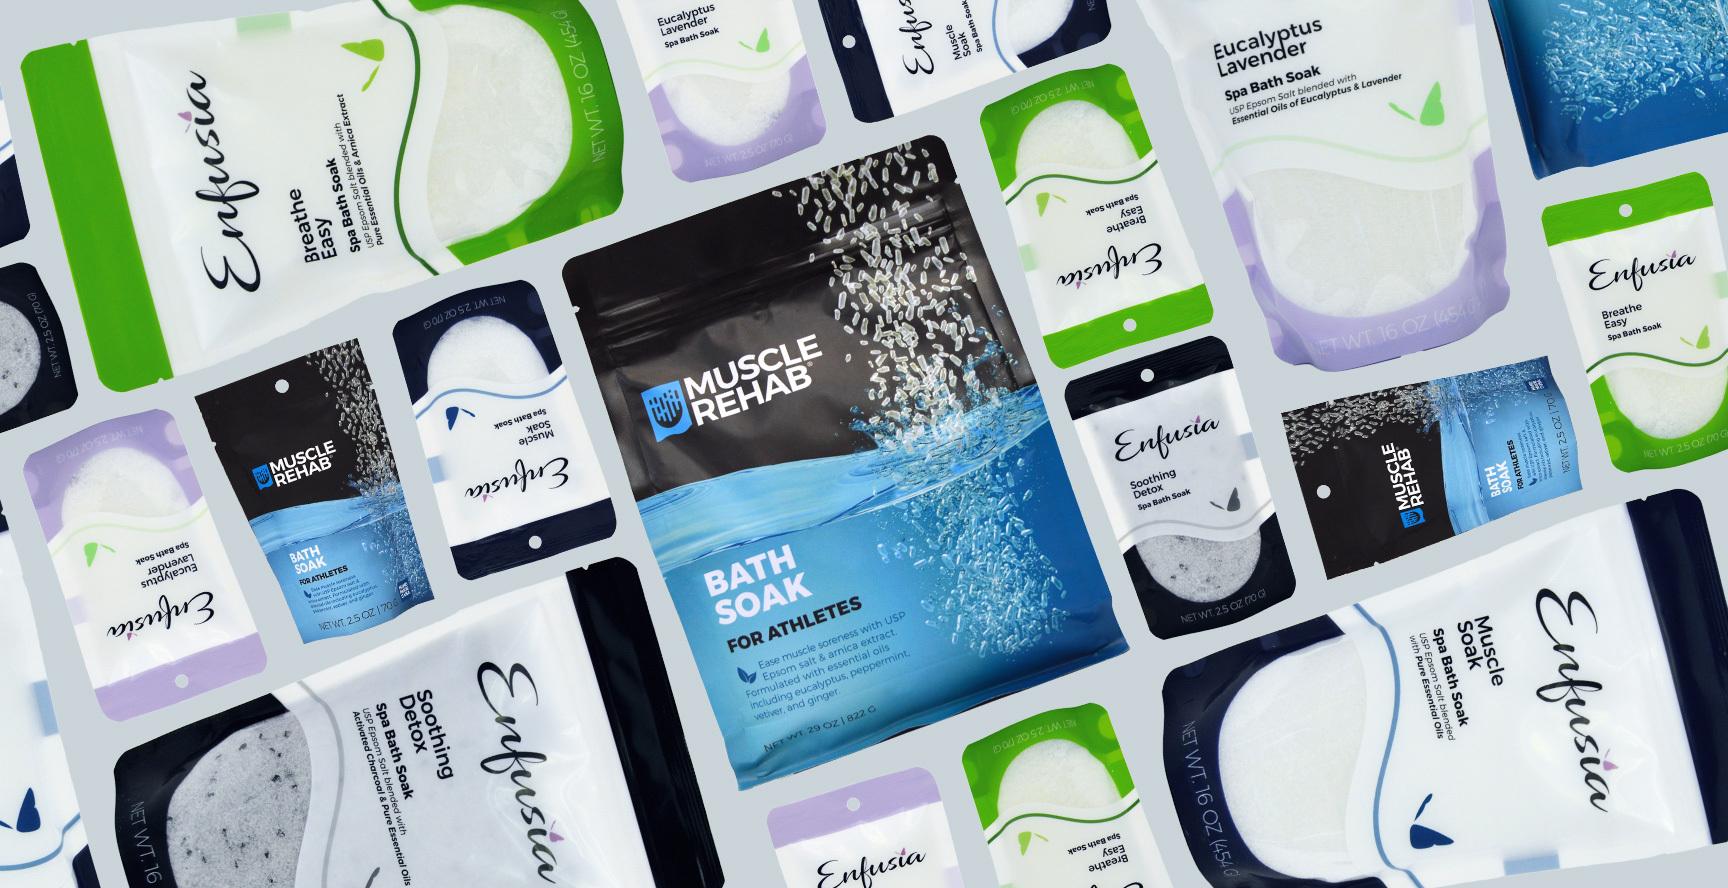 Enfusia Epsom salt bath soaks